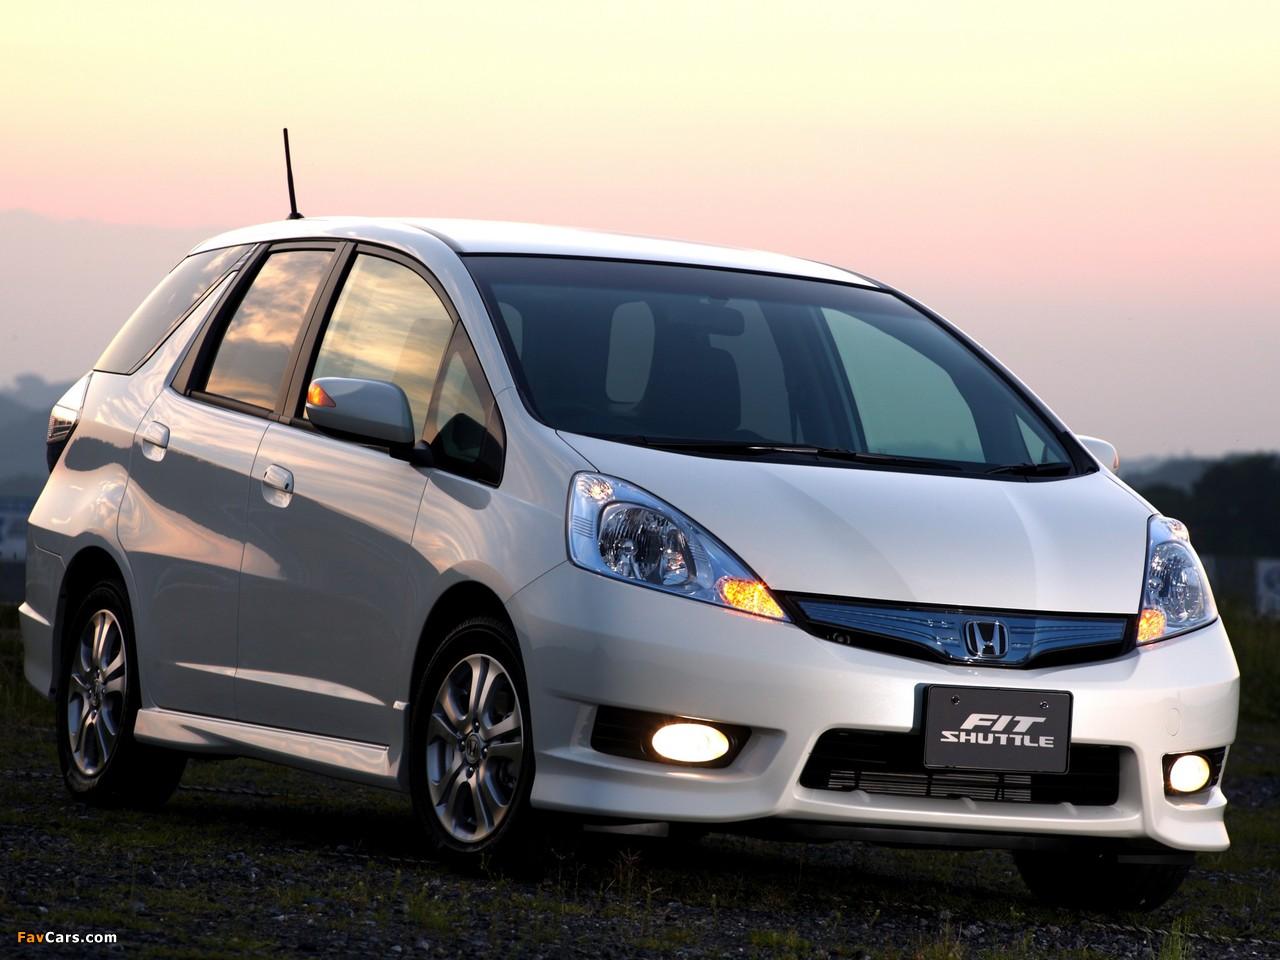 Honda Fit Shuttle Hybrid (GP2) 2011 wallpapers (1280x960)